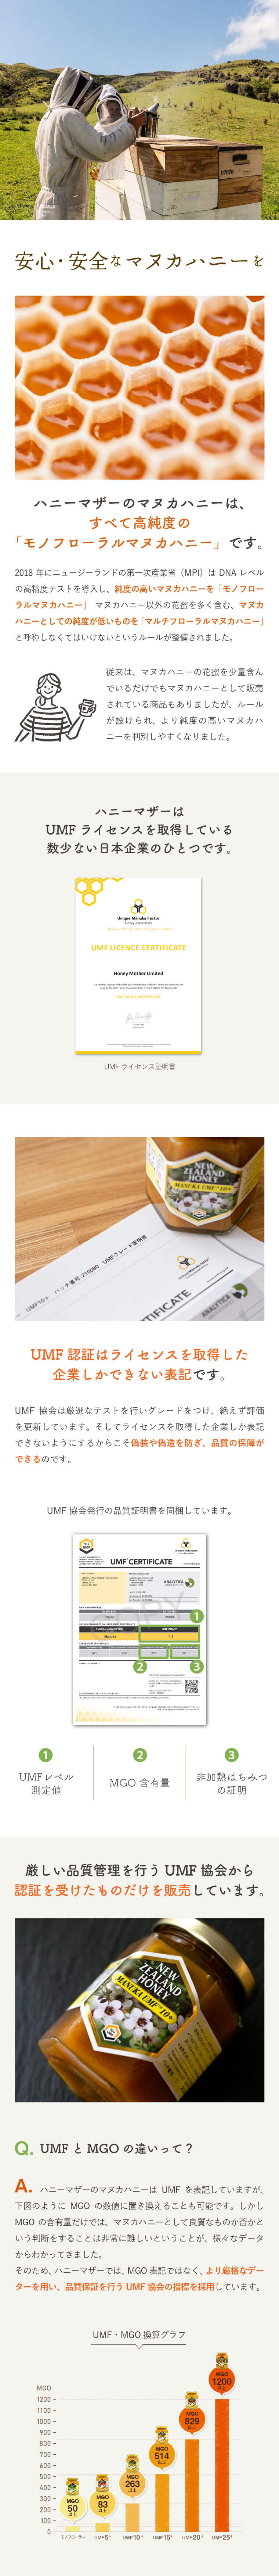 UMFライセンス